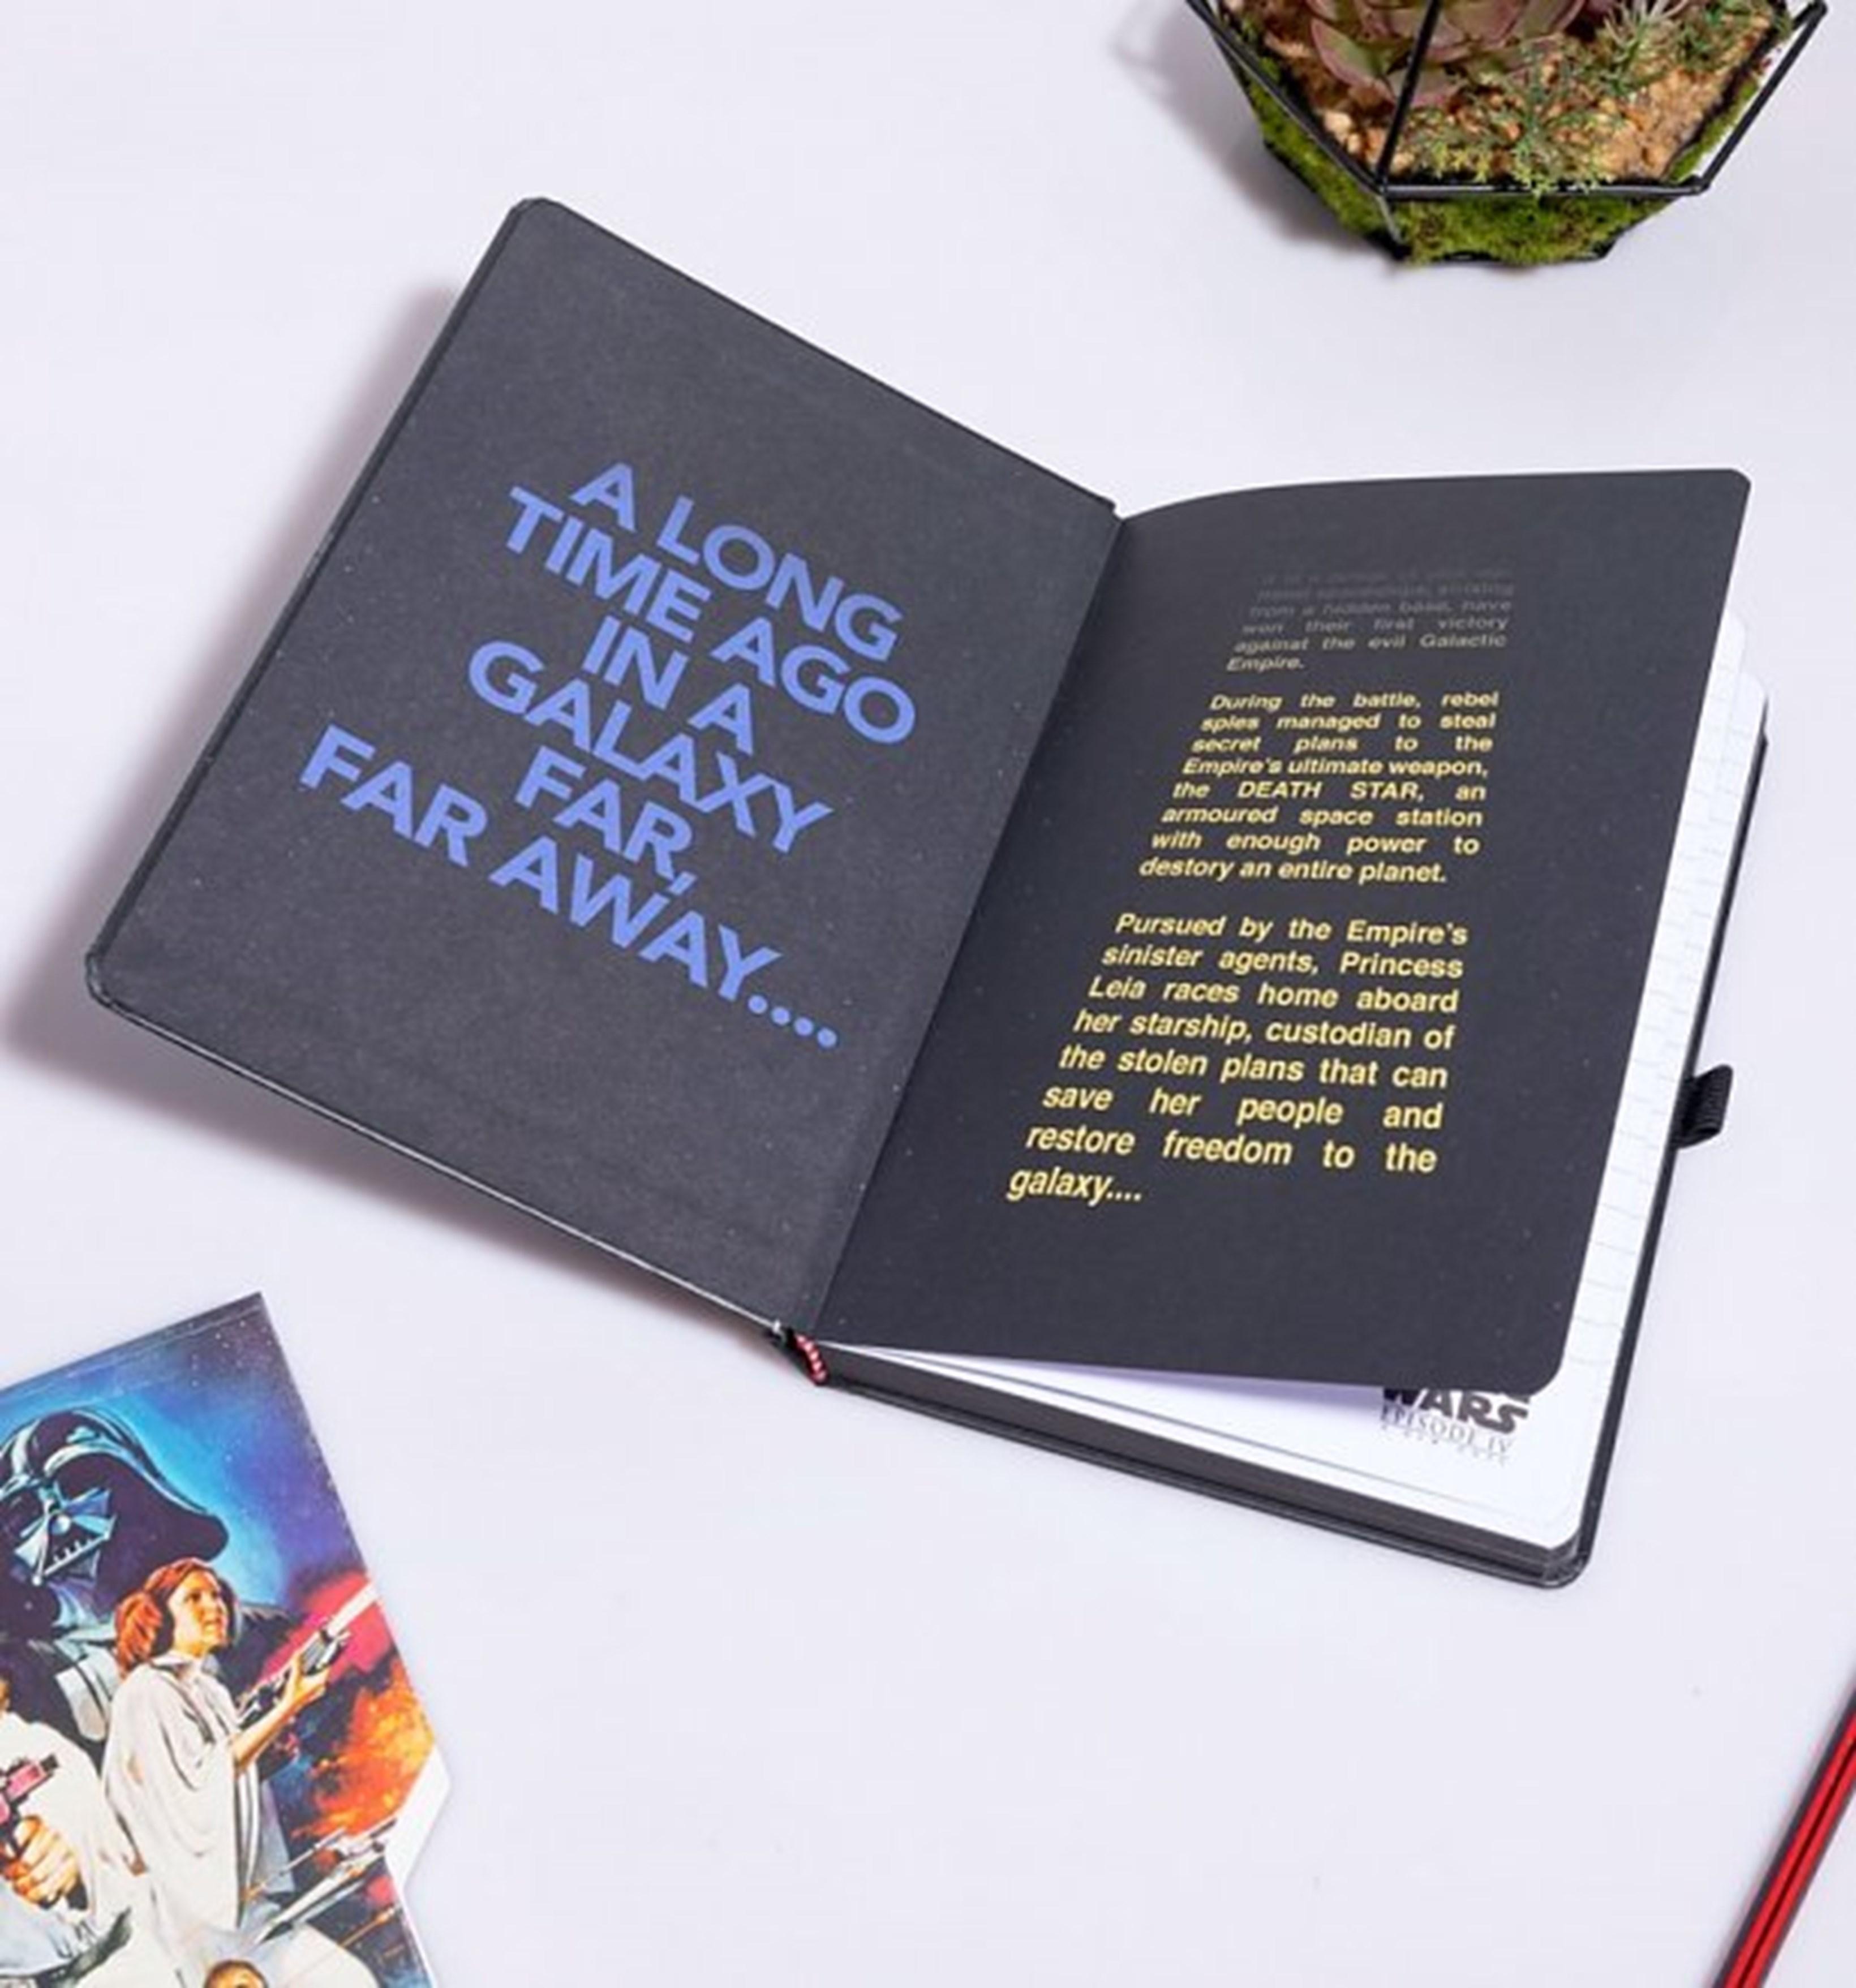 Star Wars (A New Hope) VHS Premium A5 Notebook - 3